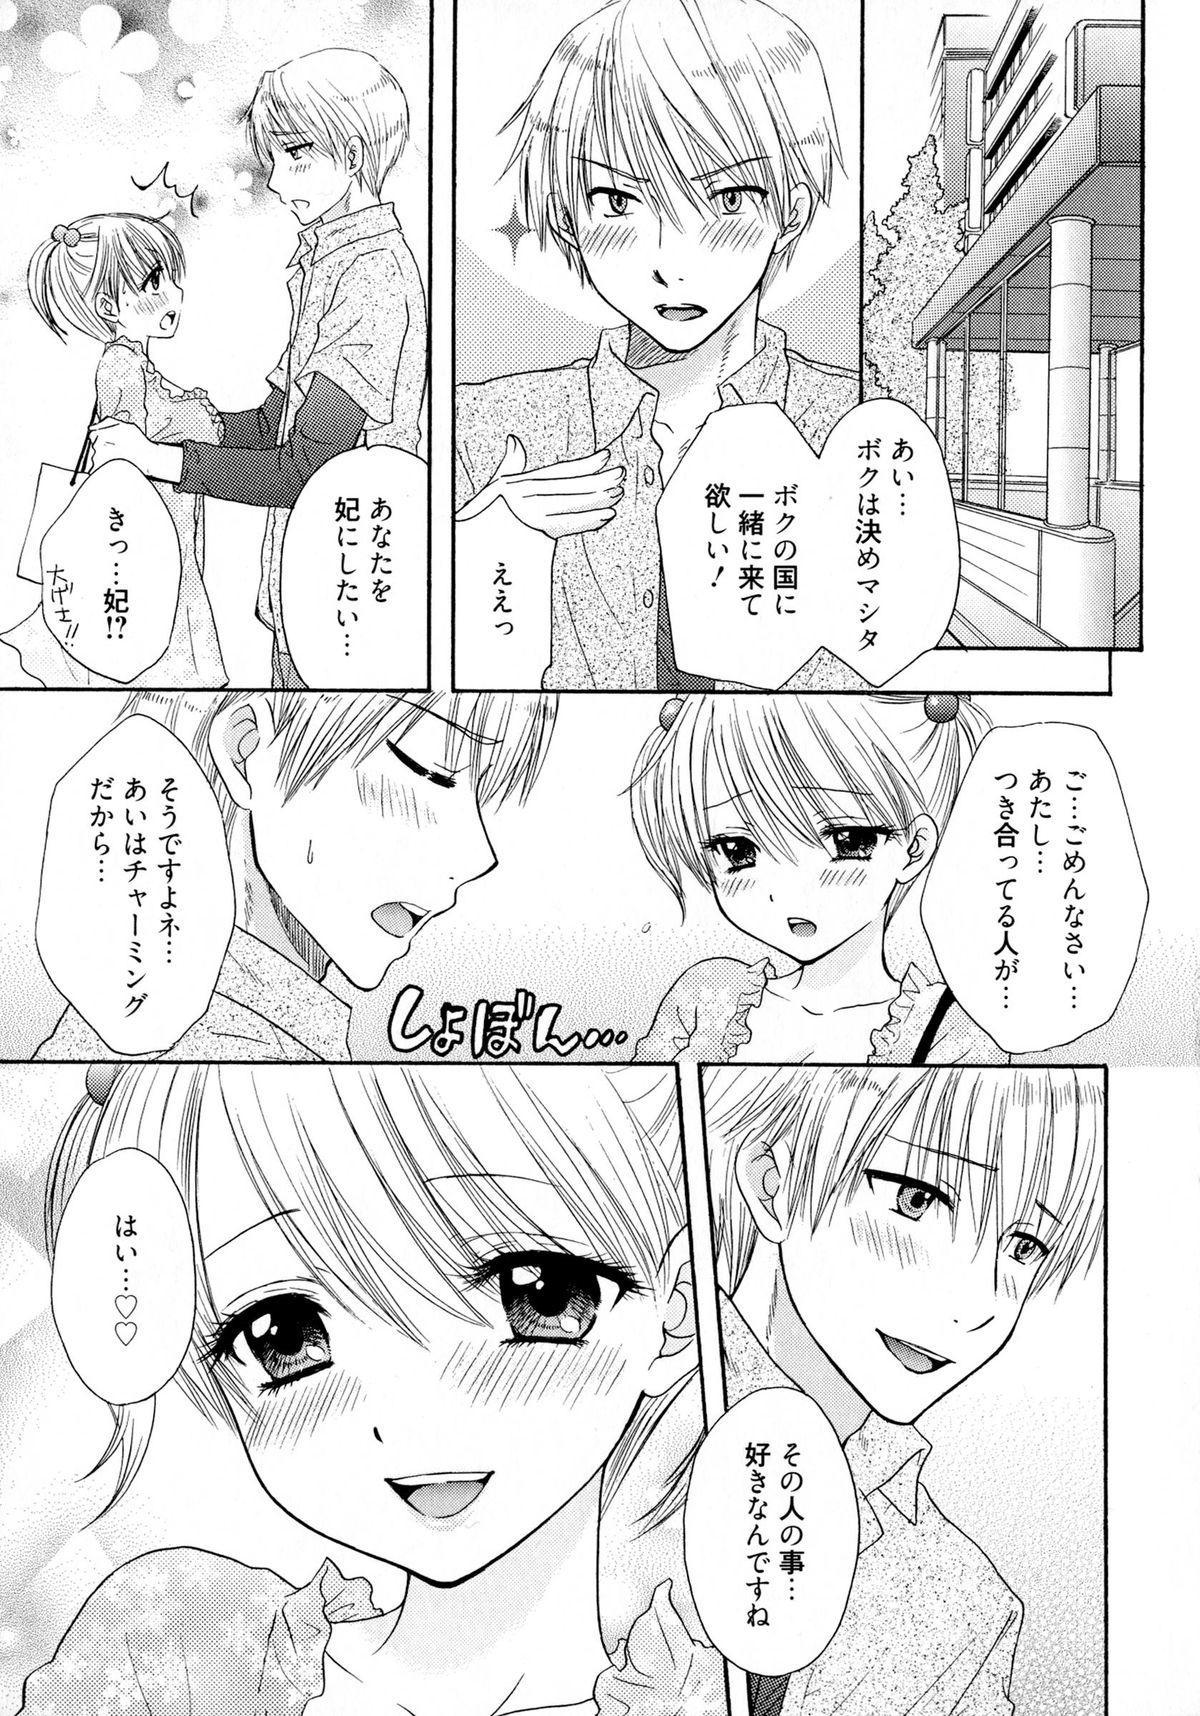 The Great Escape 4 Shokai Genteiban 166